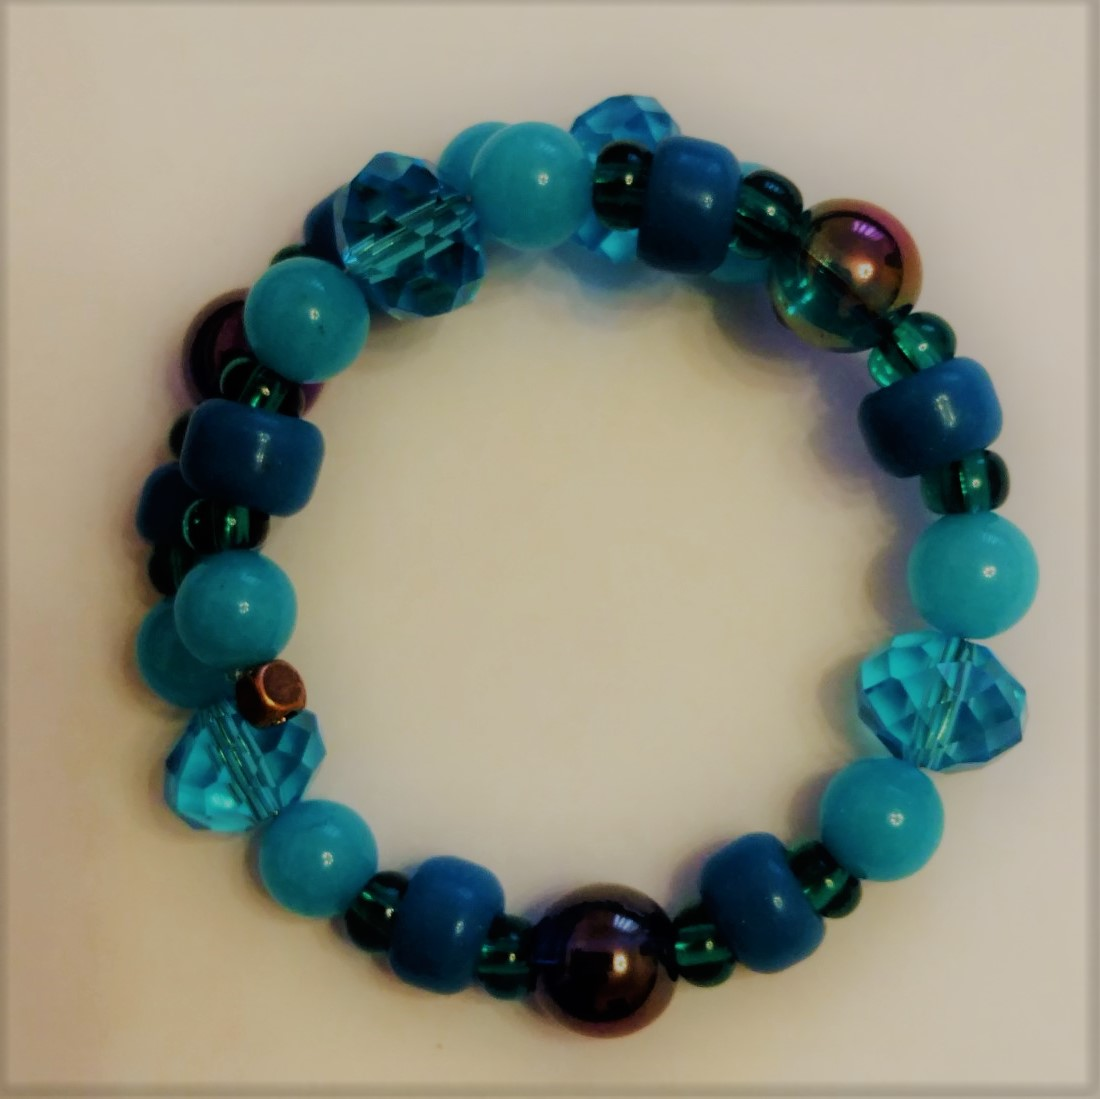 #L&L 181214 Bracelet  Suggested $12 USD